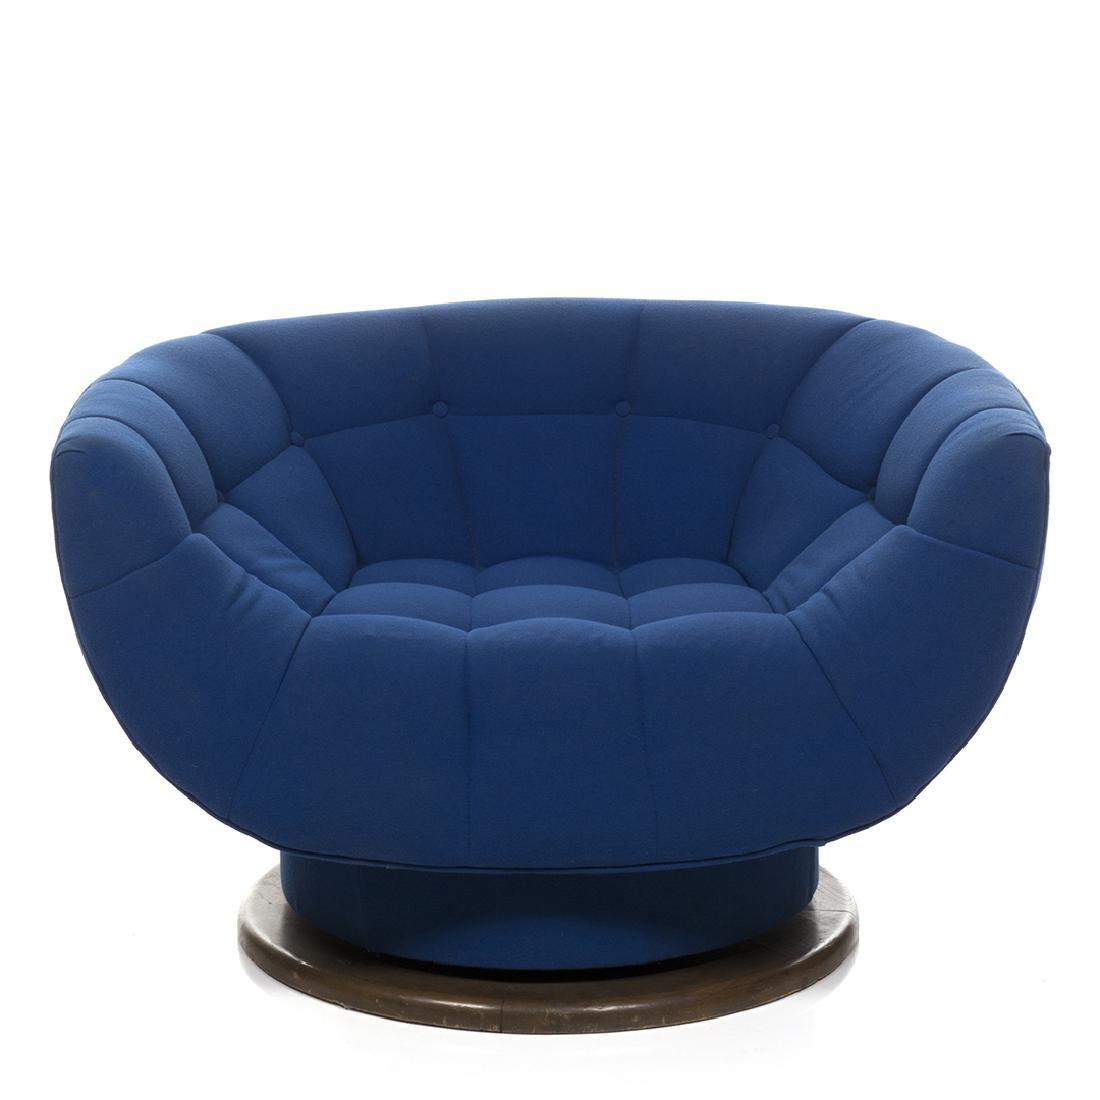 Monumental Adrian Pearsall Swivel Lounge Chair